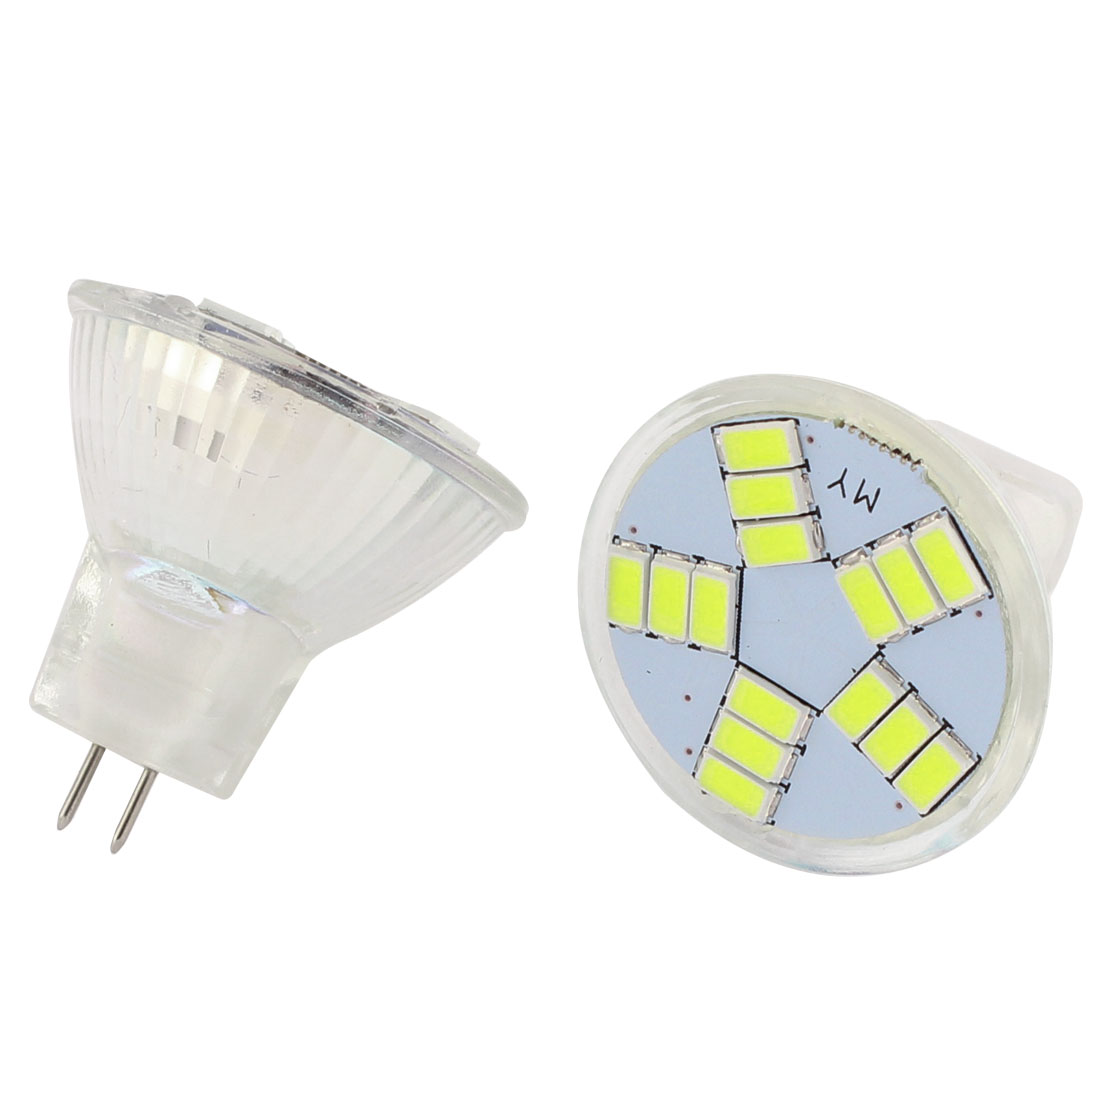 2 Pcs Car G4 Round White 5630 SMD 15 LED Bulb Internal